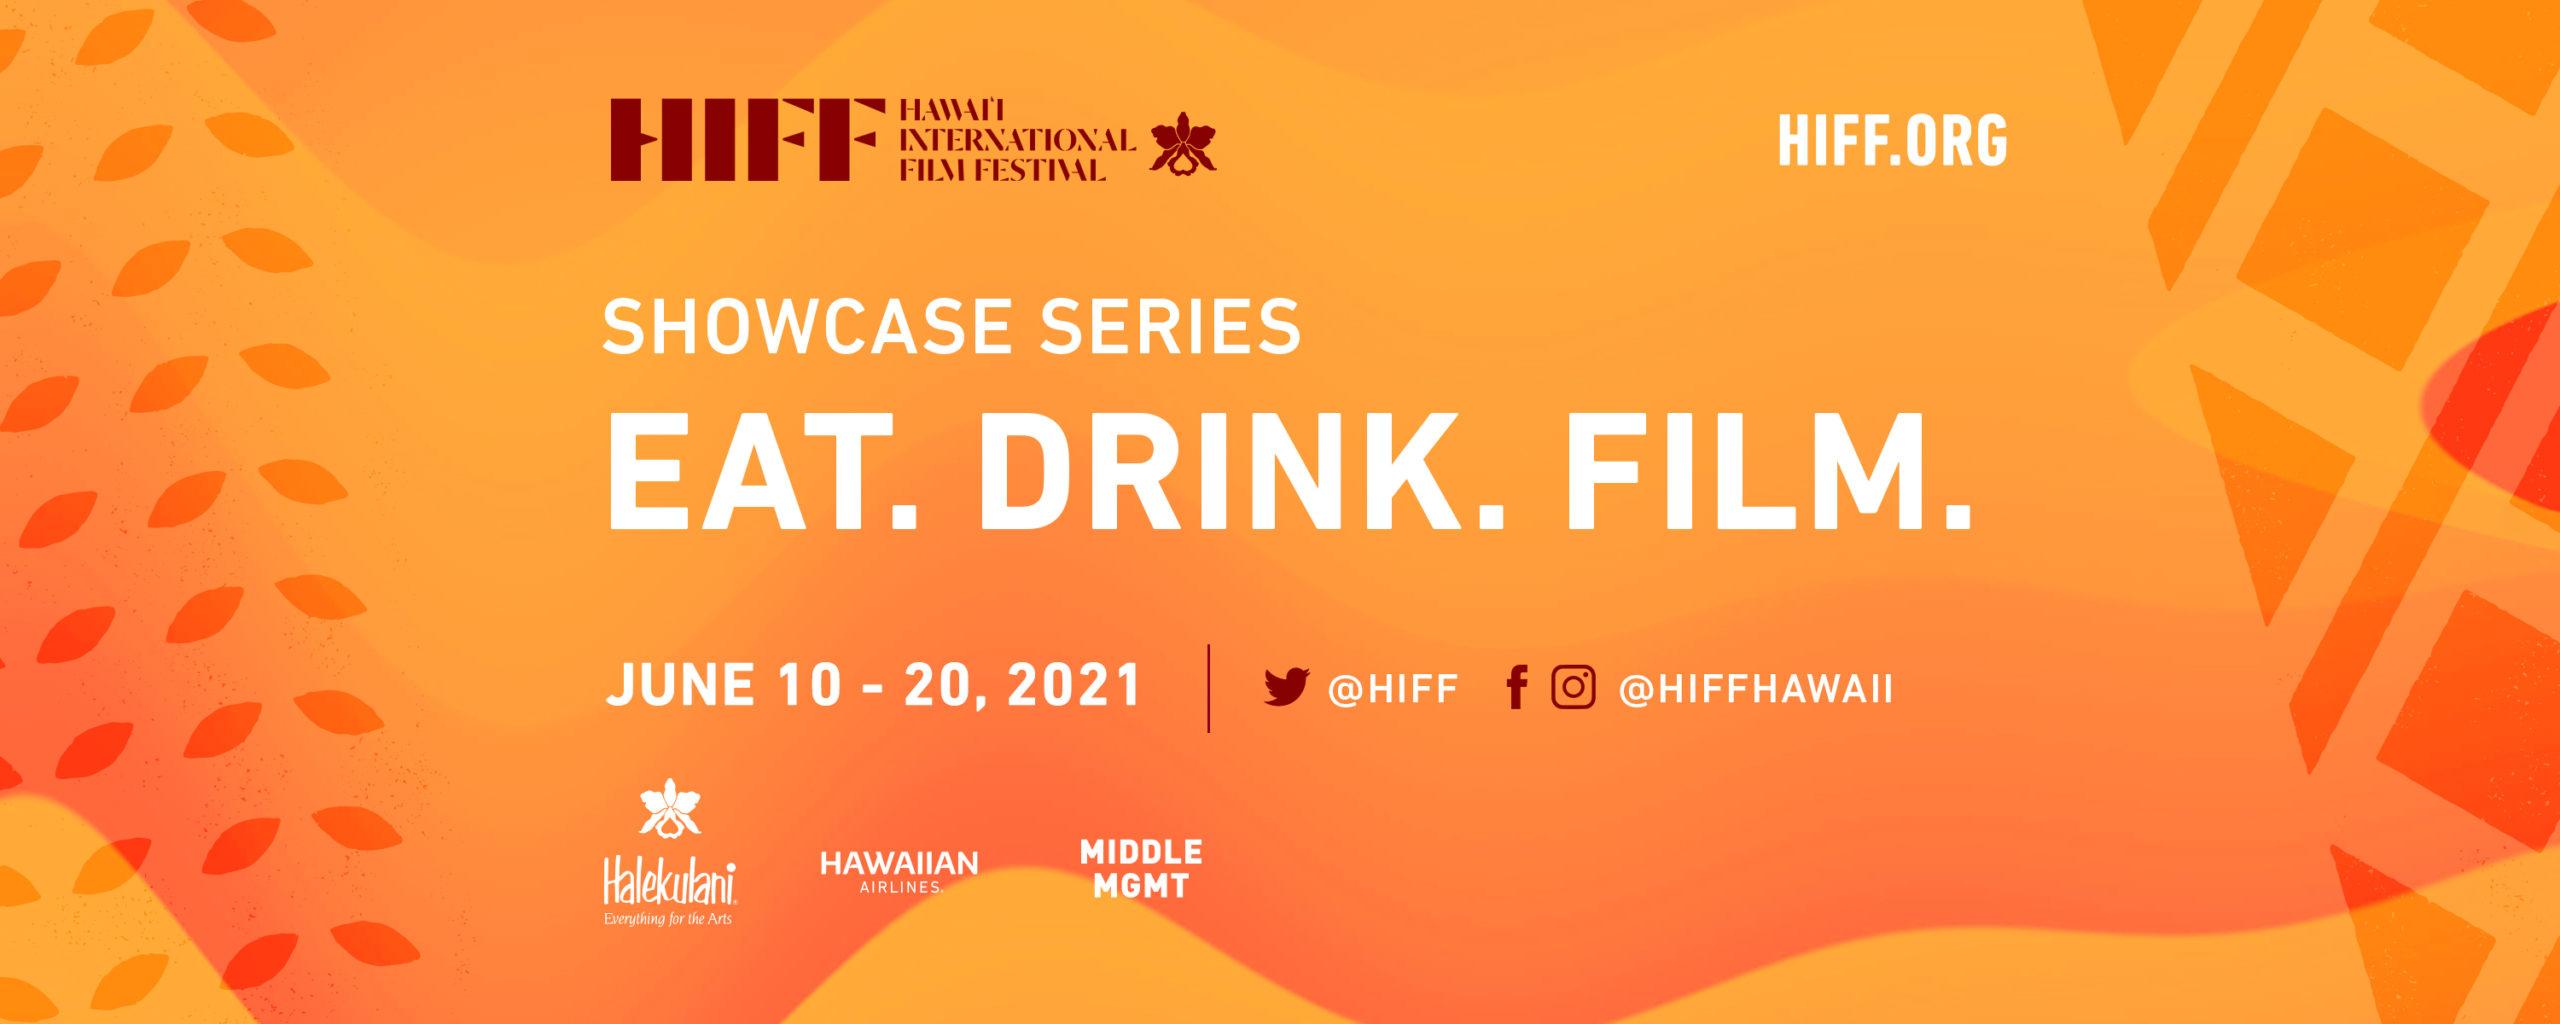 HIFF EAT. DRINK. FILM.